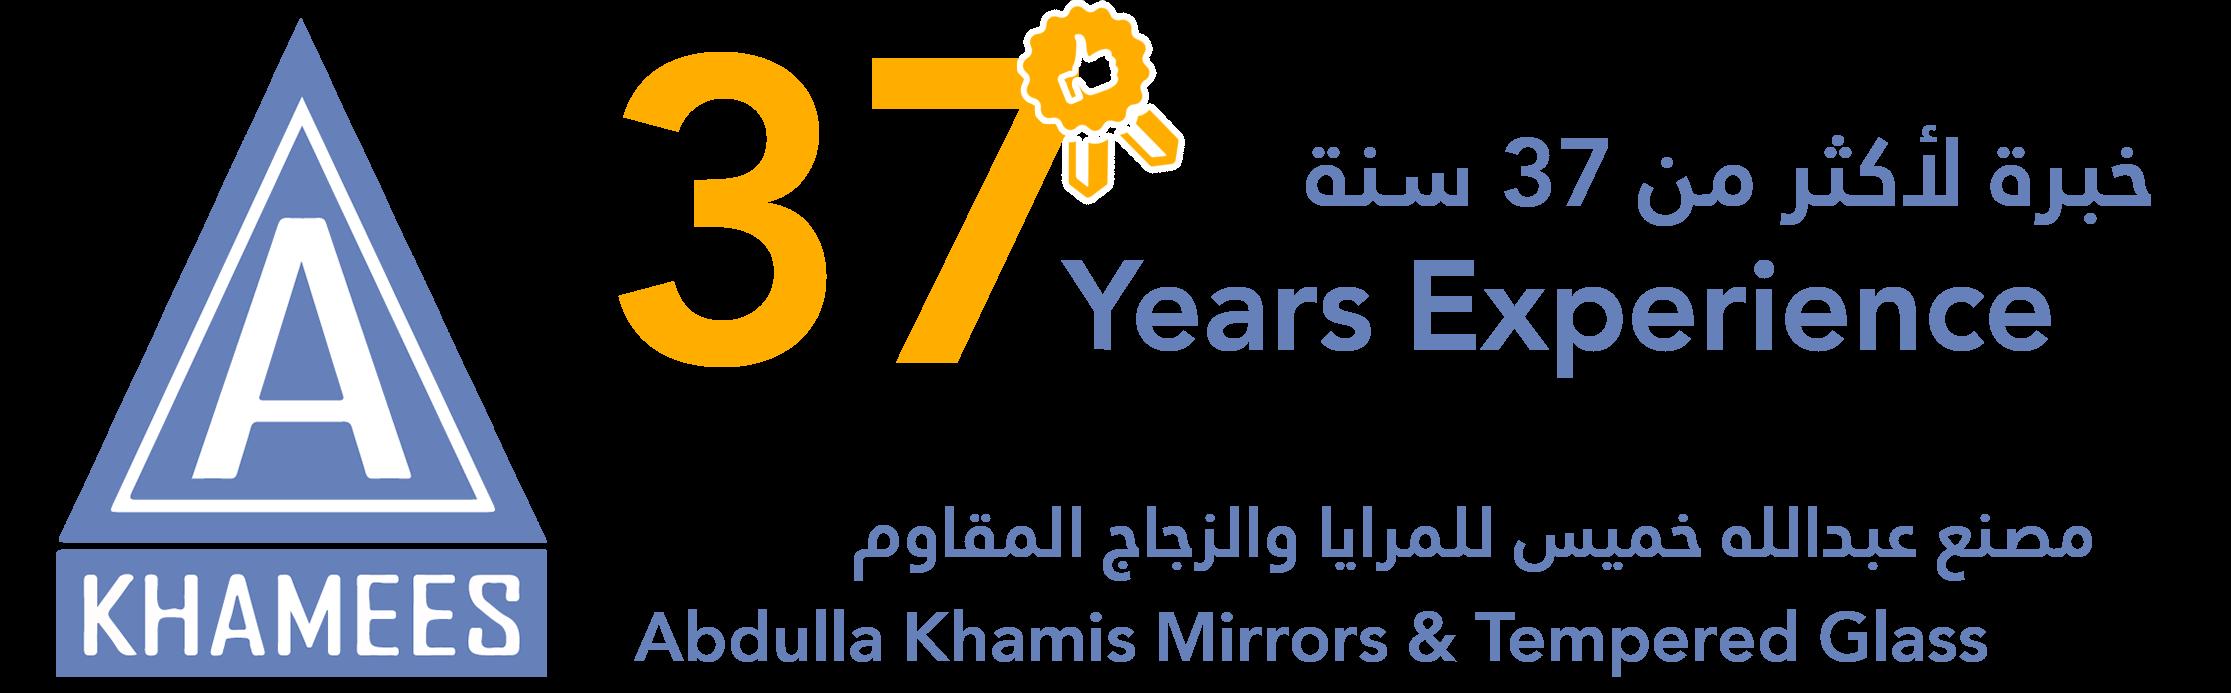 Abdullah Khamis Glass & Mirrors – Bahrain